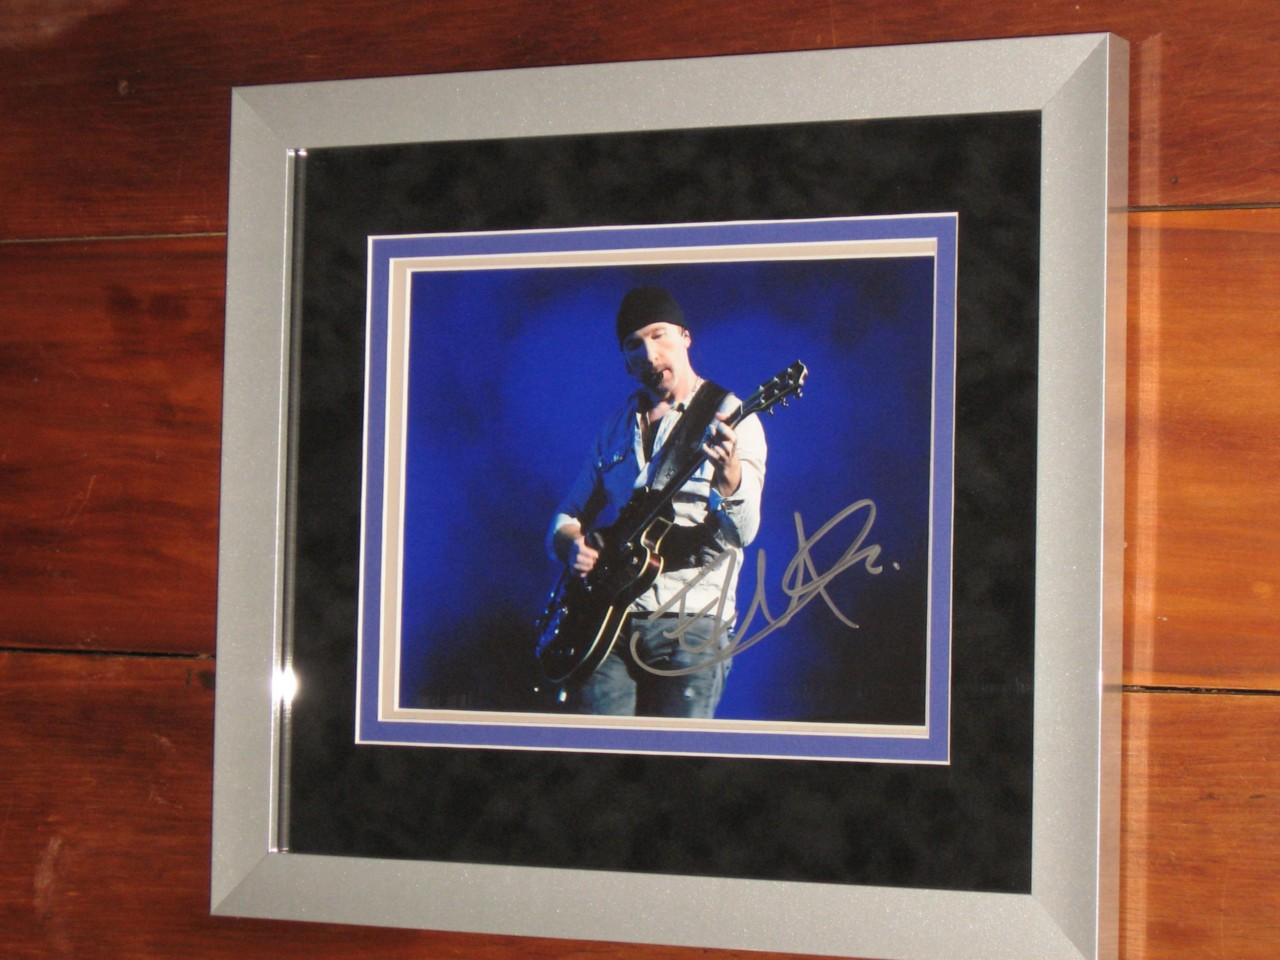 U2-SIGNED-CUSTOM-FRAMED-8-X-10-PHOTO-EDGE-VERY-RARE